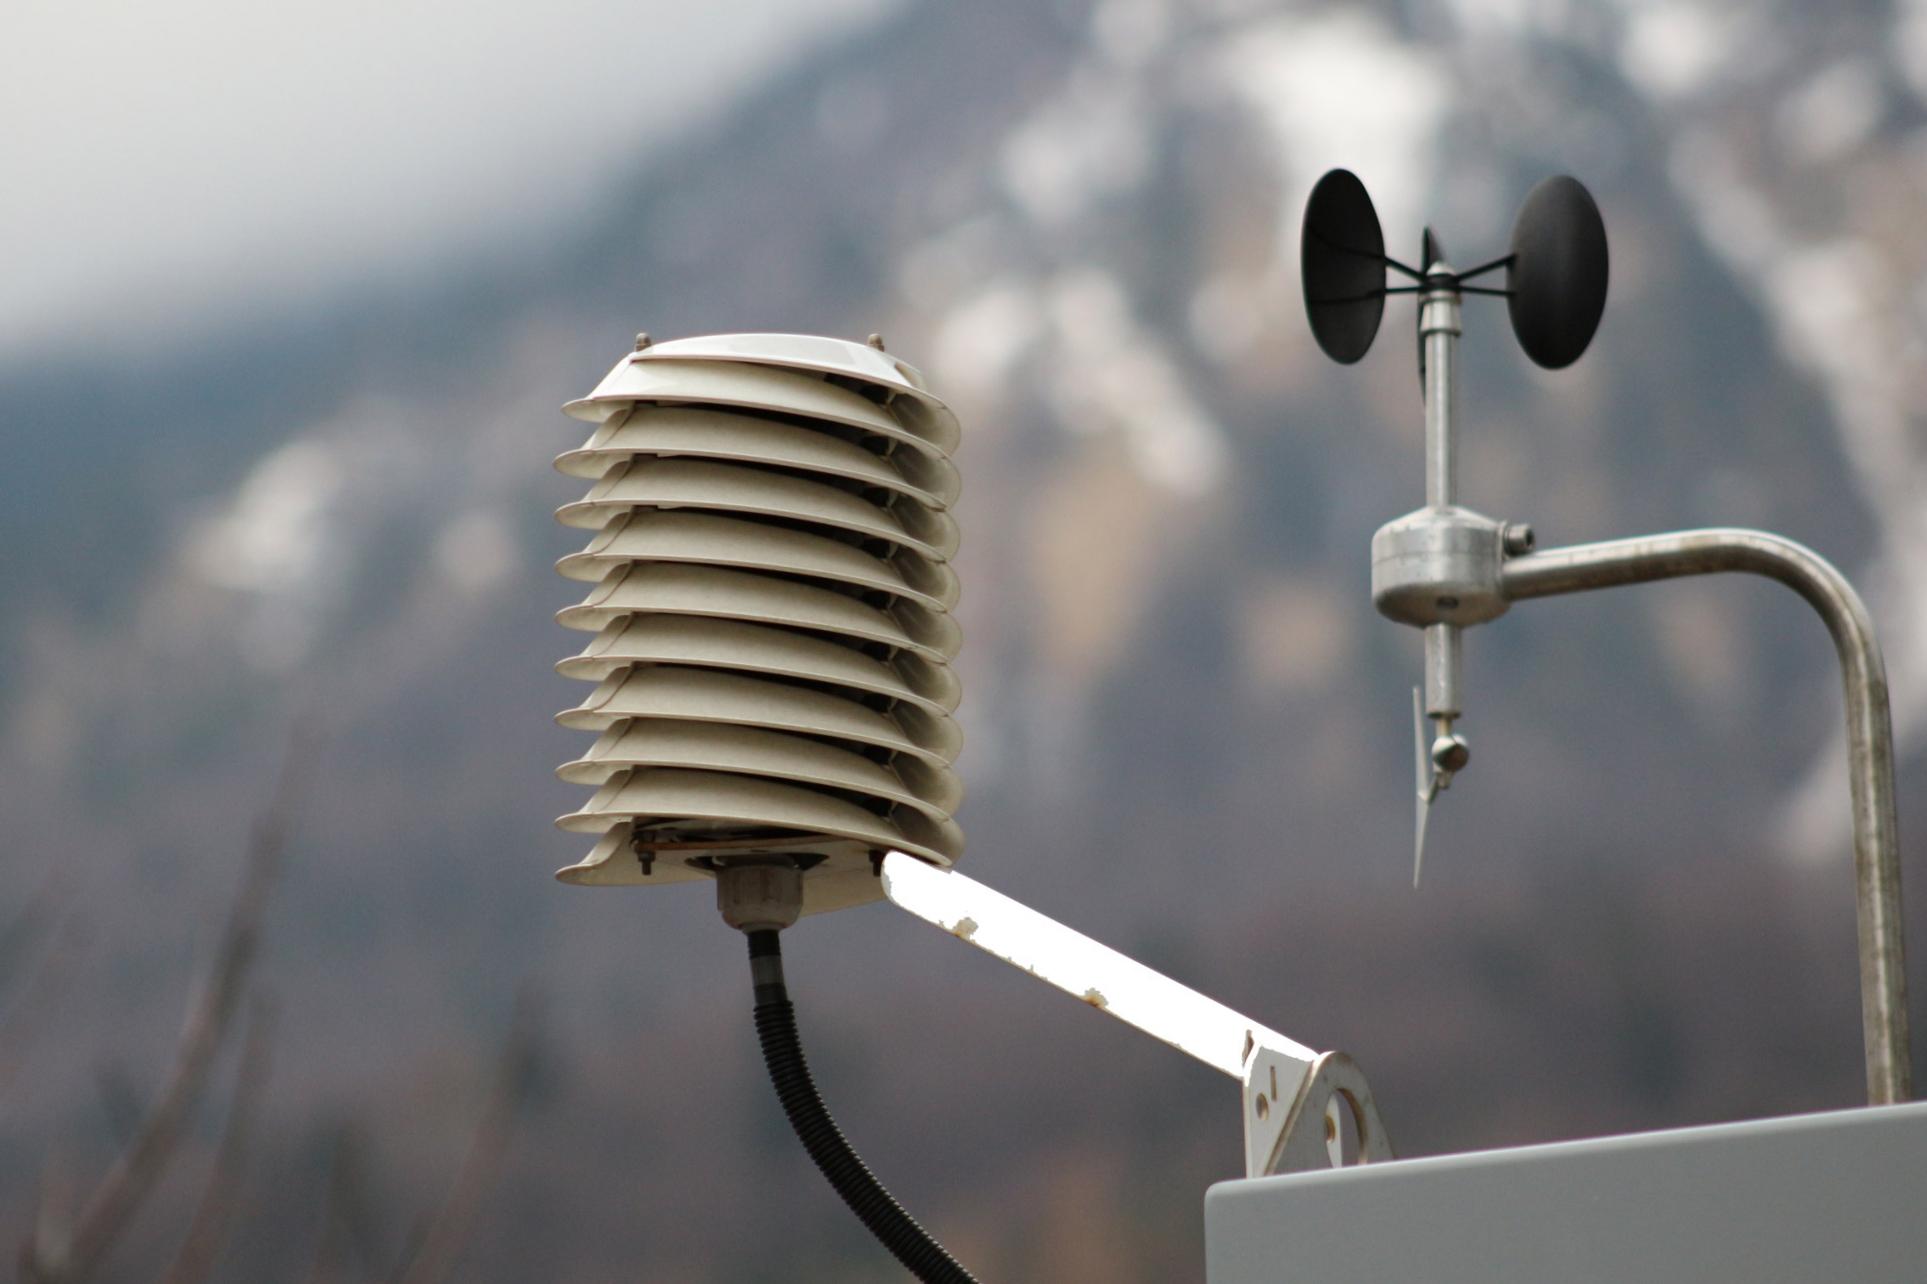 Road weather station radiation shield & anemometer Barani Design